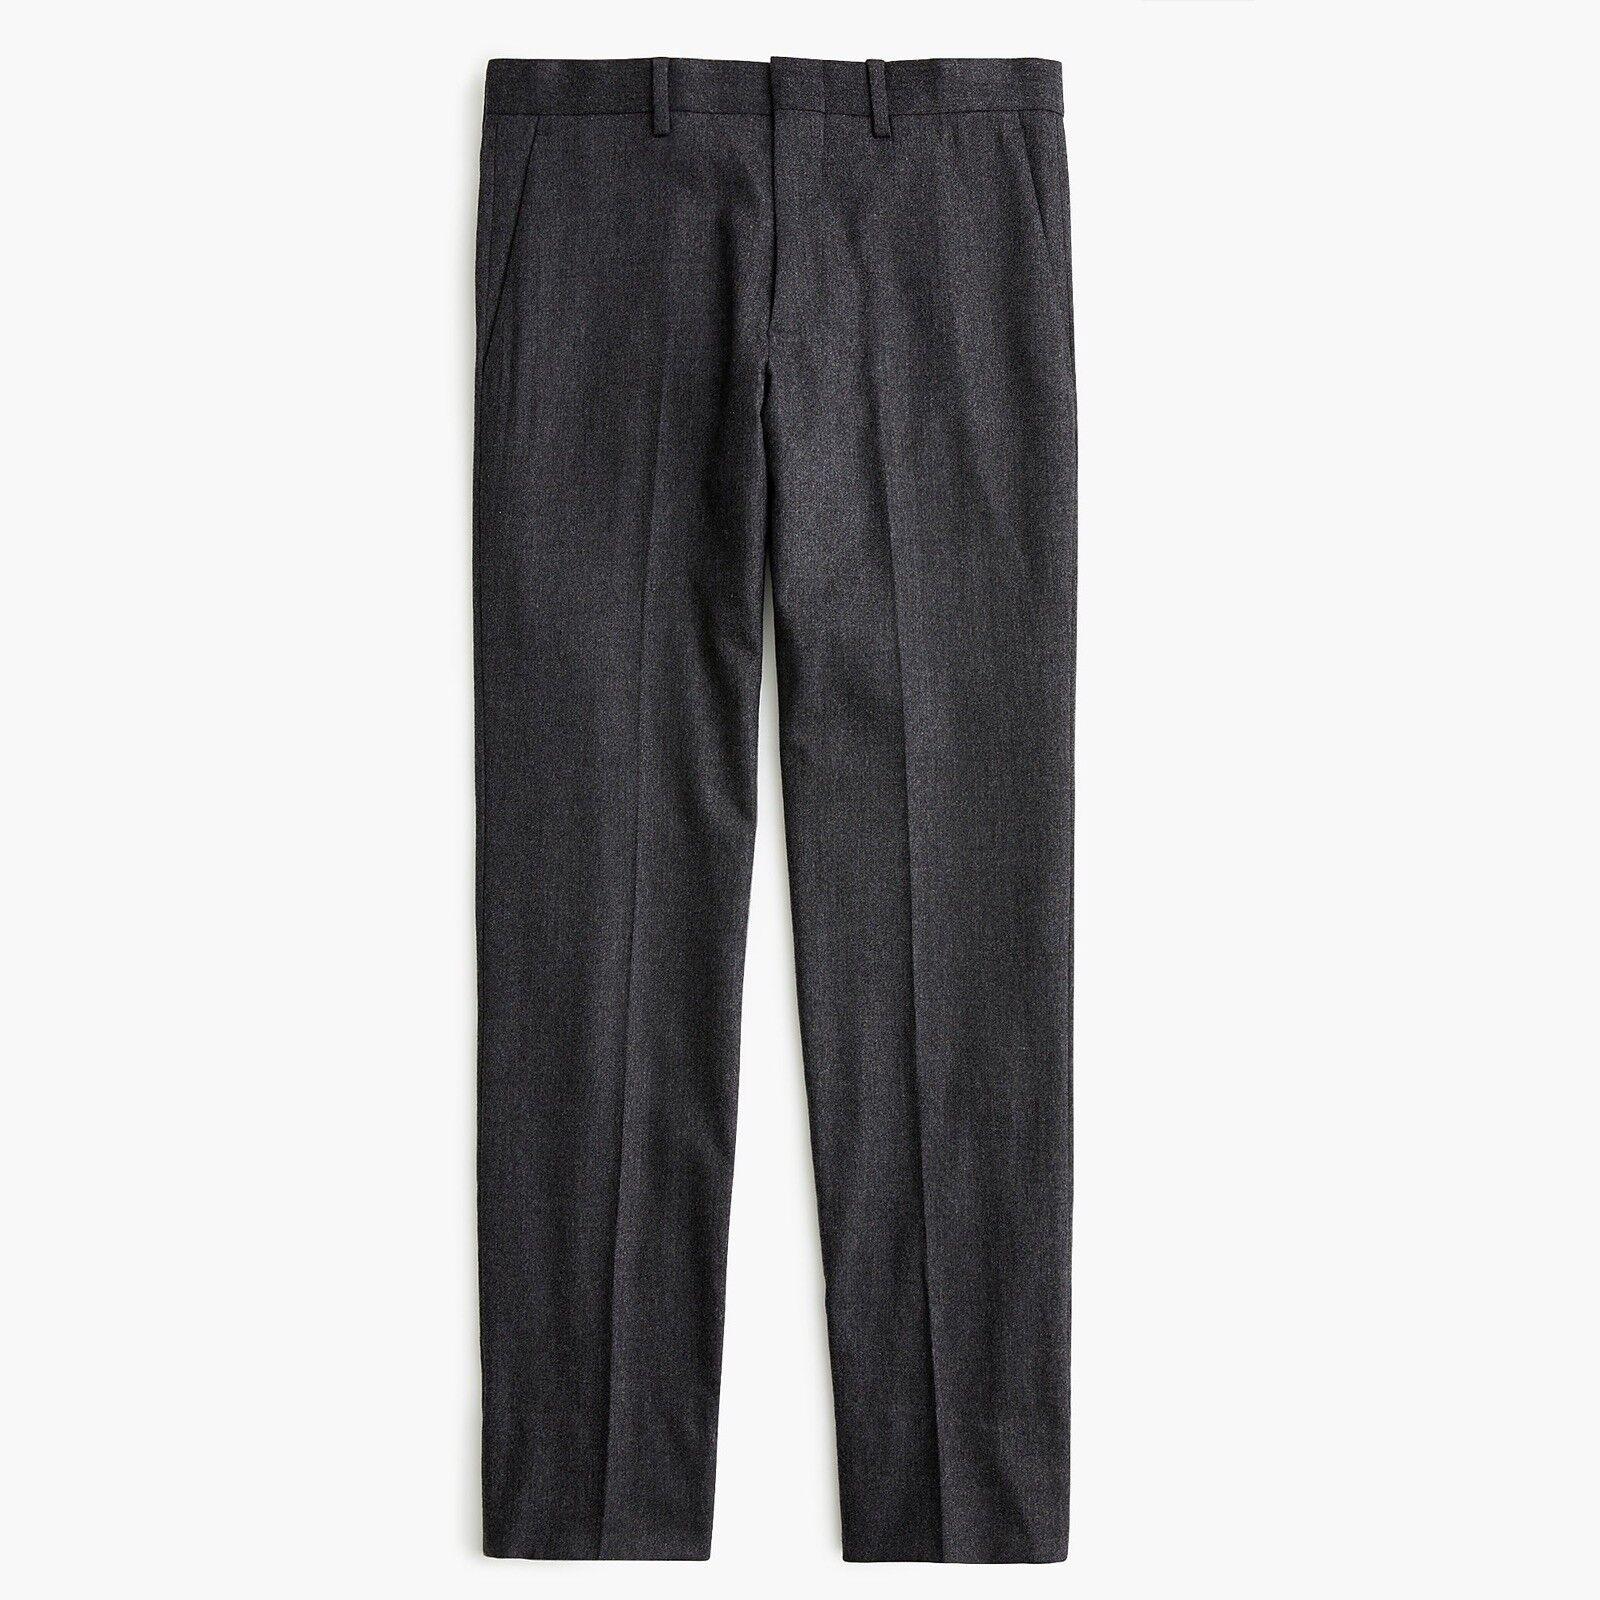 J CREW 32 x 30 Ludlow Slim-fit Suit Pant Charcoal Italian Stretch Wool Flannel